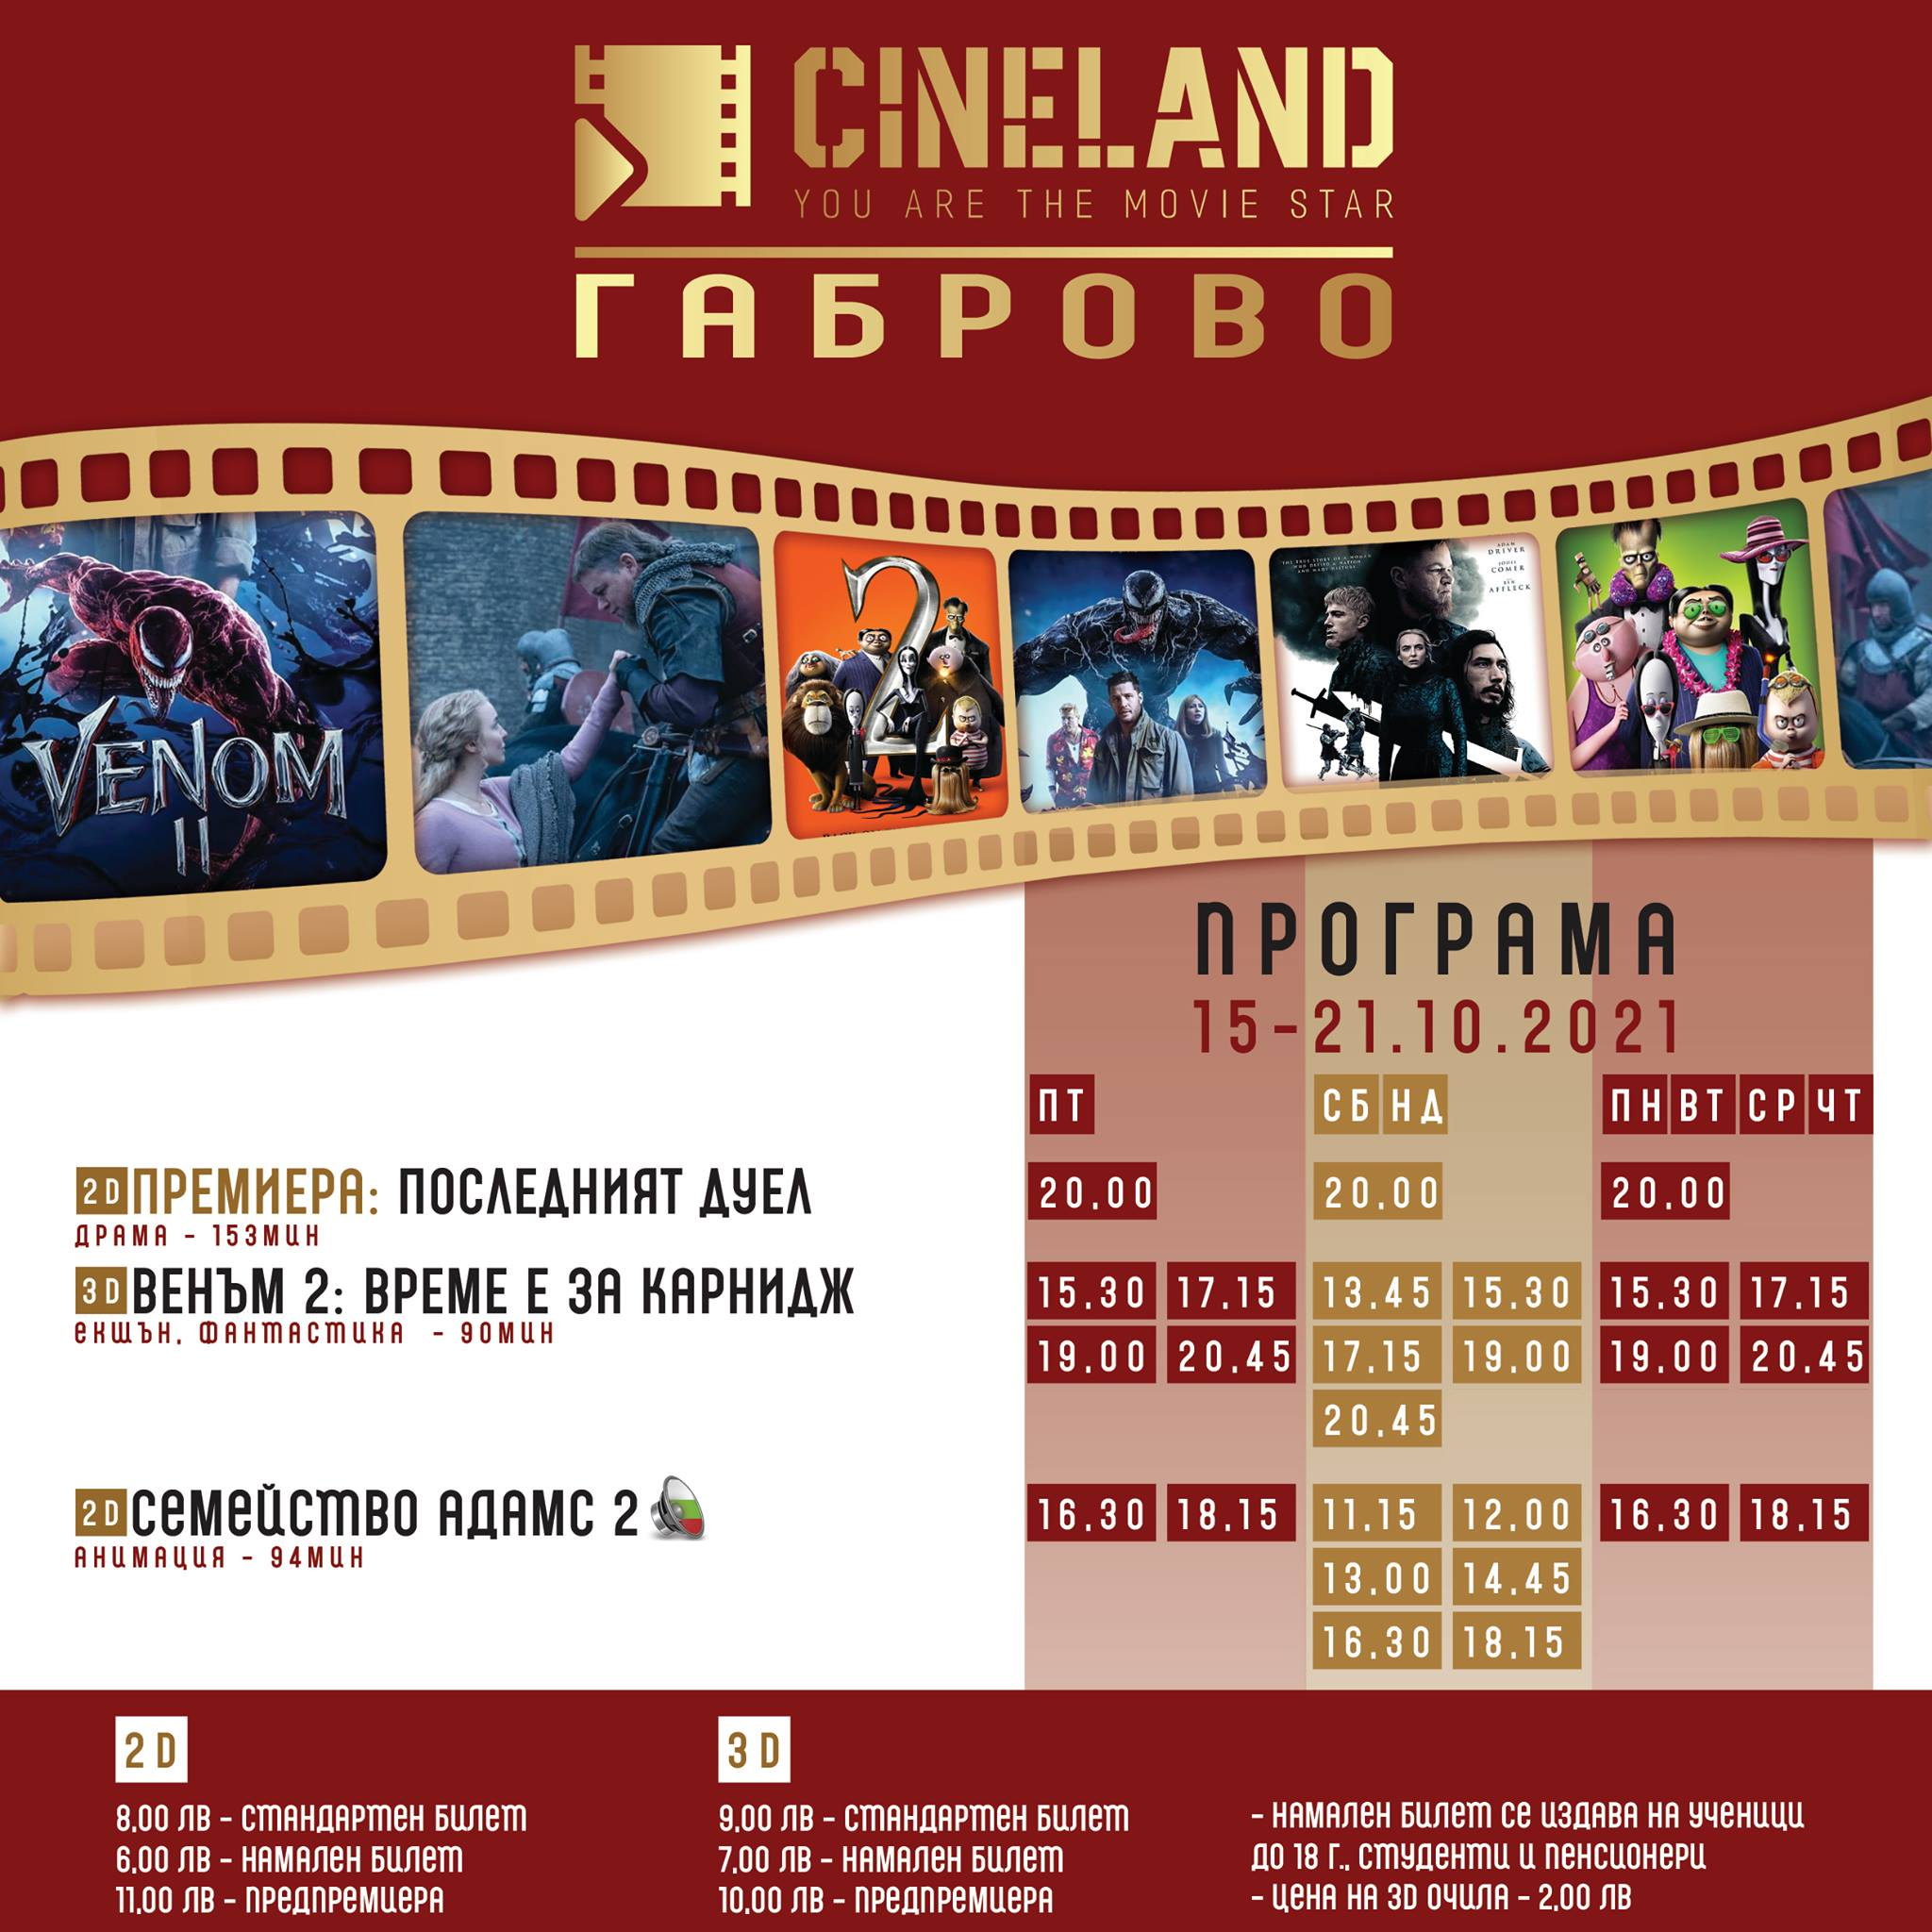 CineLand Габрово: Кино програма - 15-21 октомври 2021